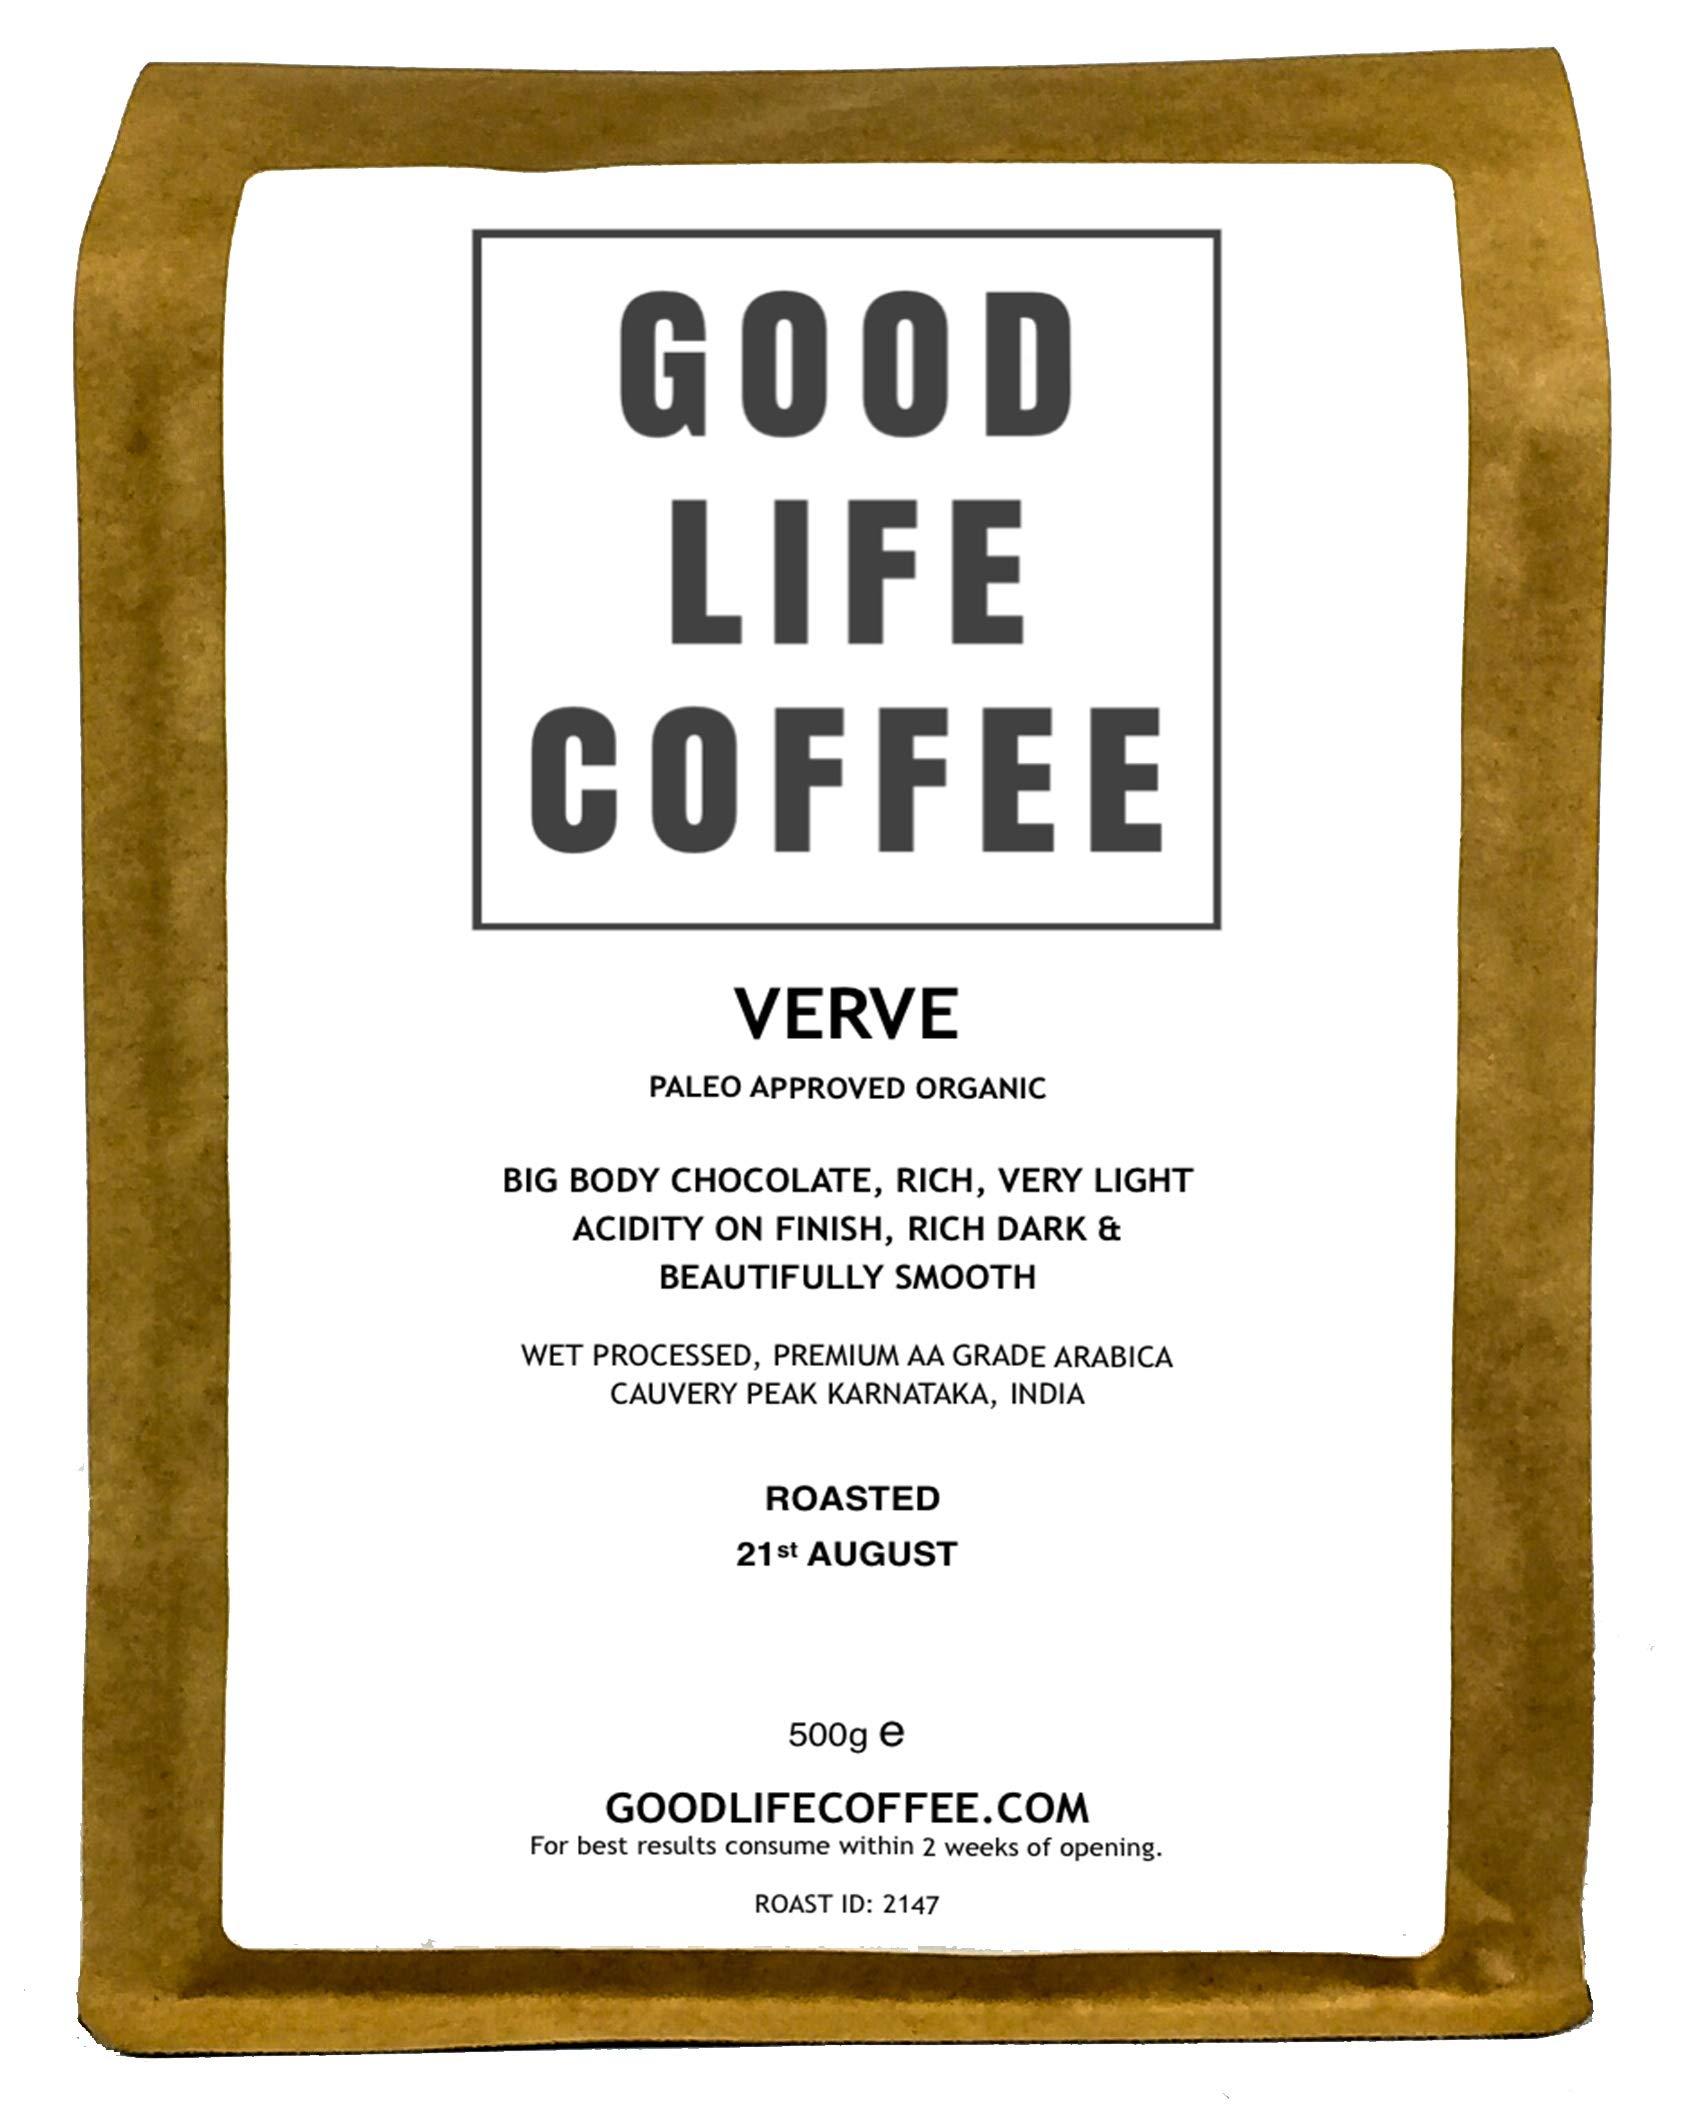 Good Life Verve Paleo Coffee 250g Ground Cafetiere Single Origin Specialty Arabica Bulletproof Coffee Fresh Roasted to Order Great Taste Winner